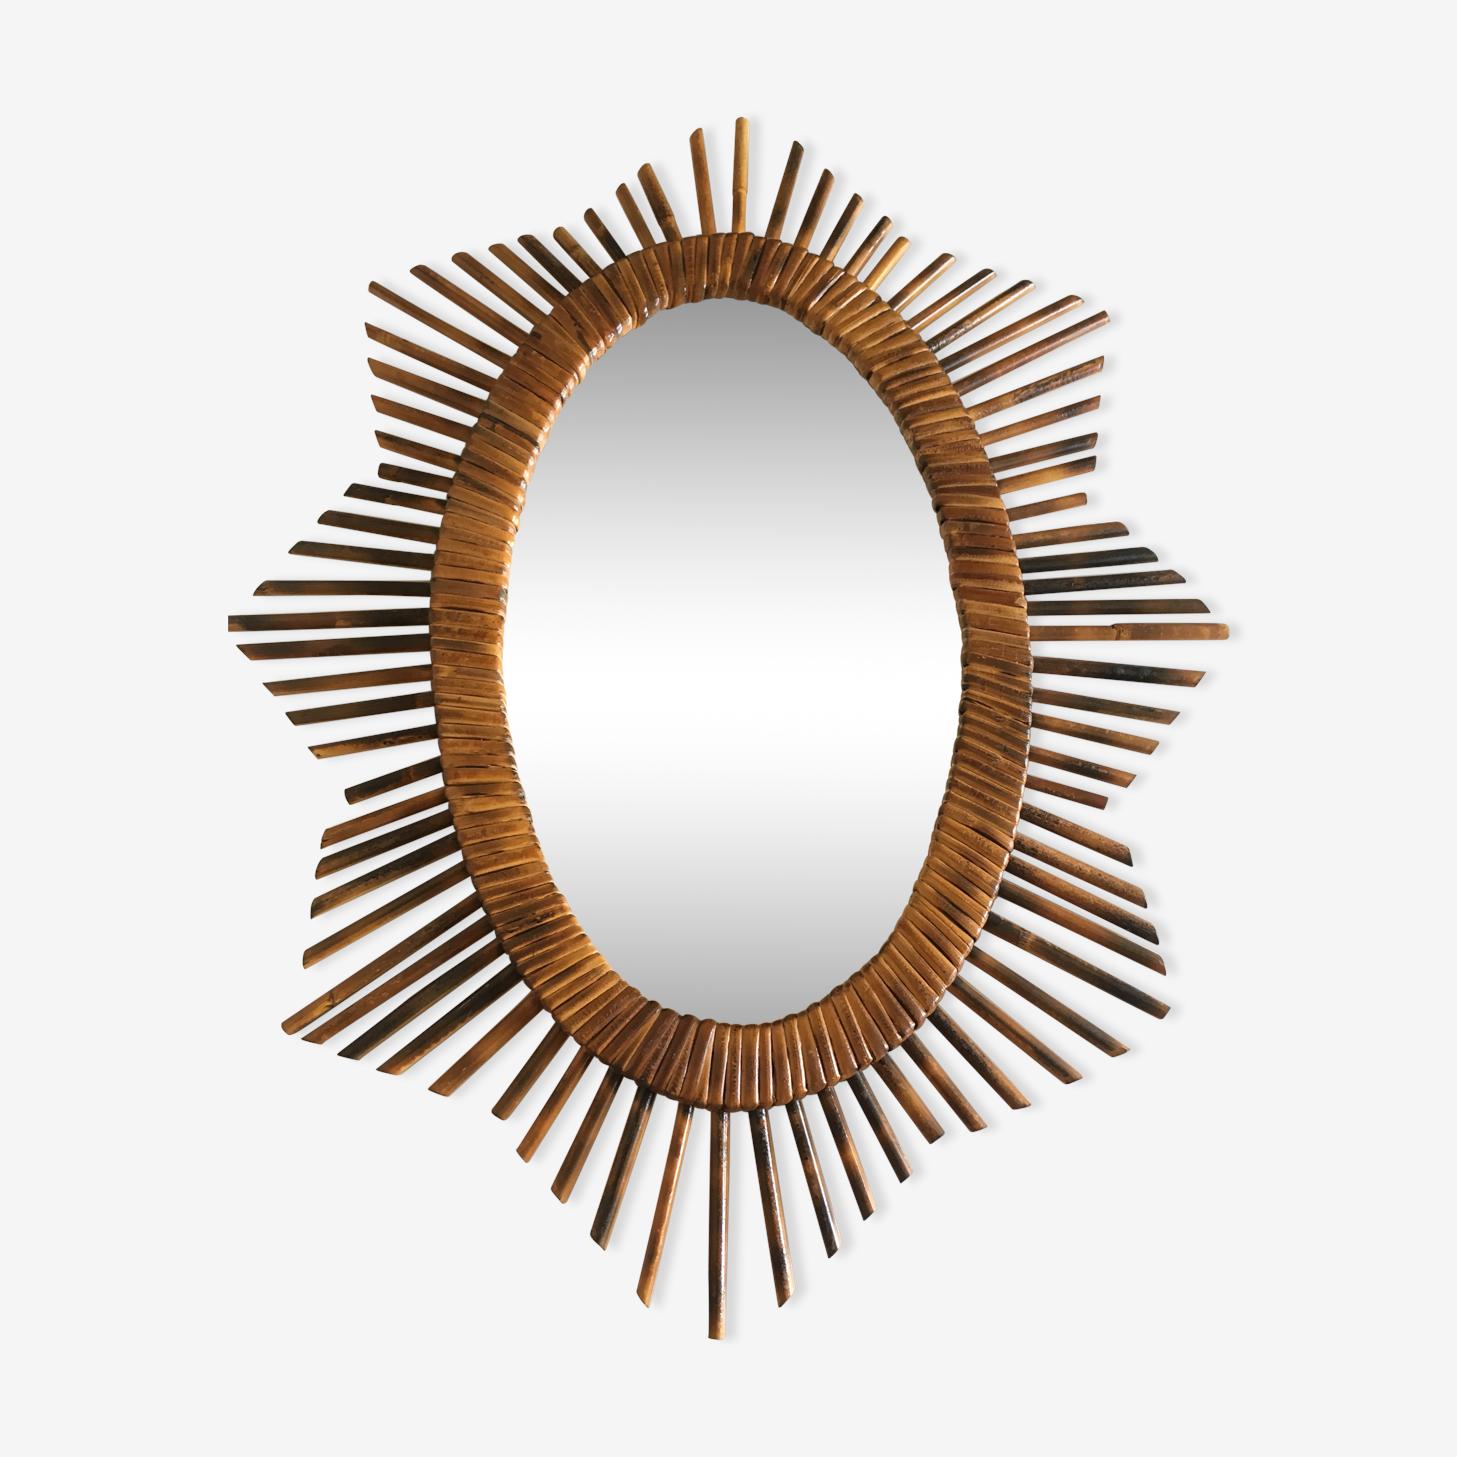 Miroir soleil ovale en rotin 58x54cm